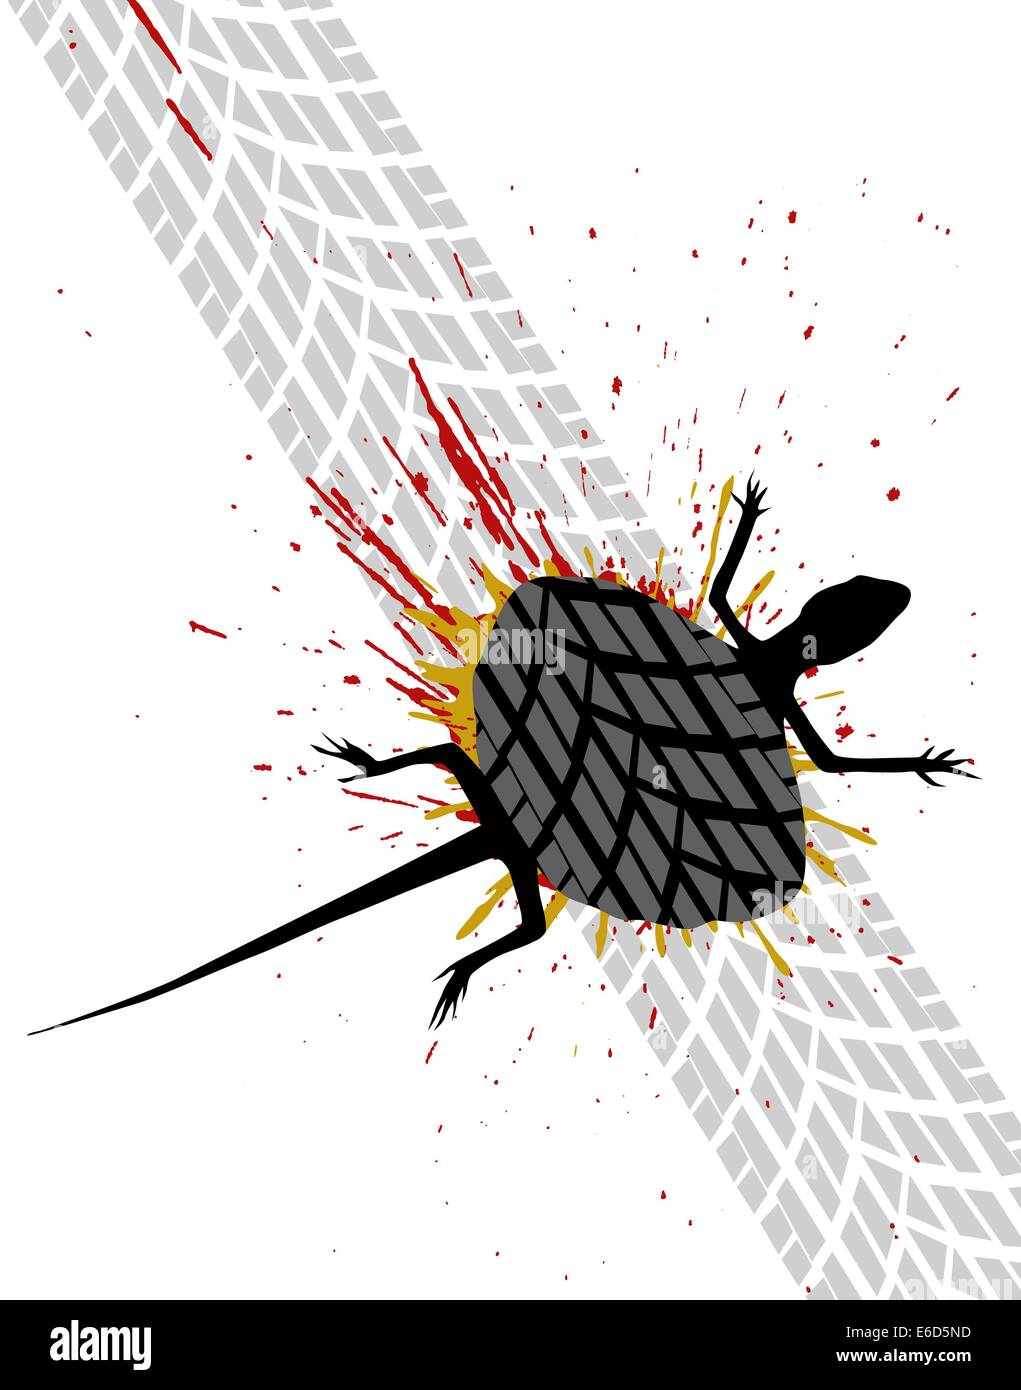 Editable vector illustration of a road-killed lizard - Stock Vector